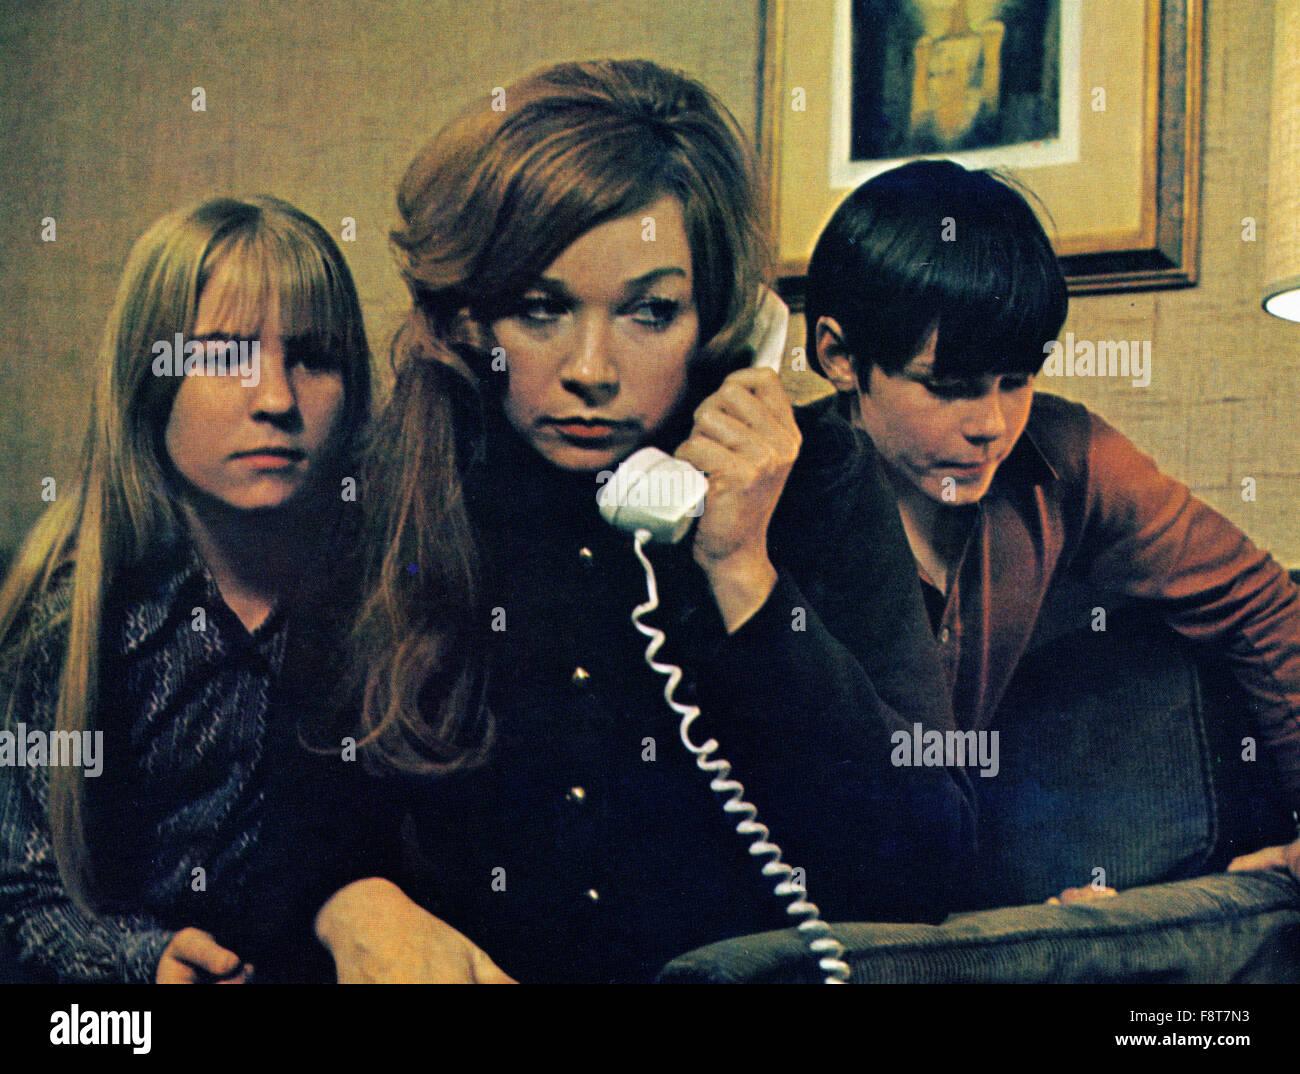 The Possession of Joel Delaney, Großbritannien 1972, Regie: Waris Hussein, Darsteller: Shirley MacLaine, Lisa - Stock Image